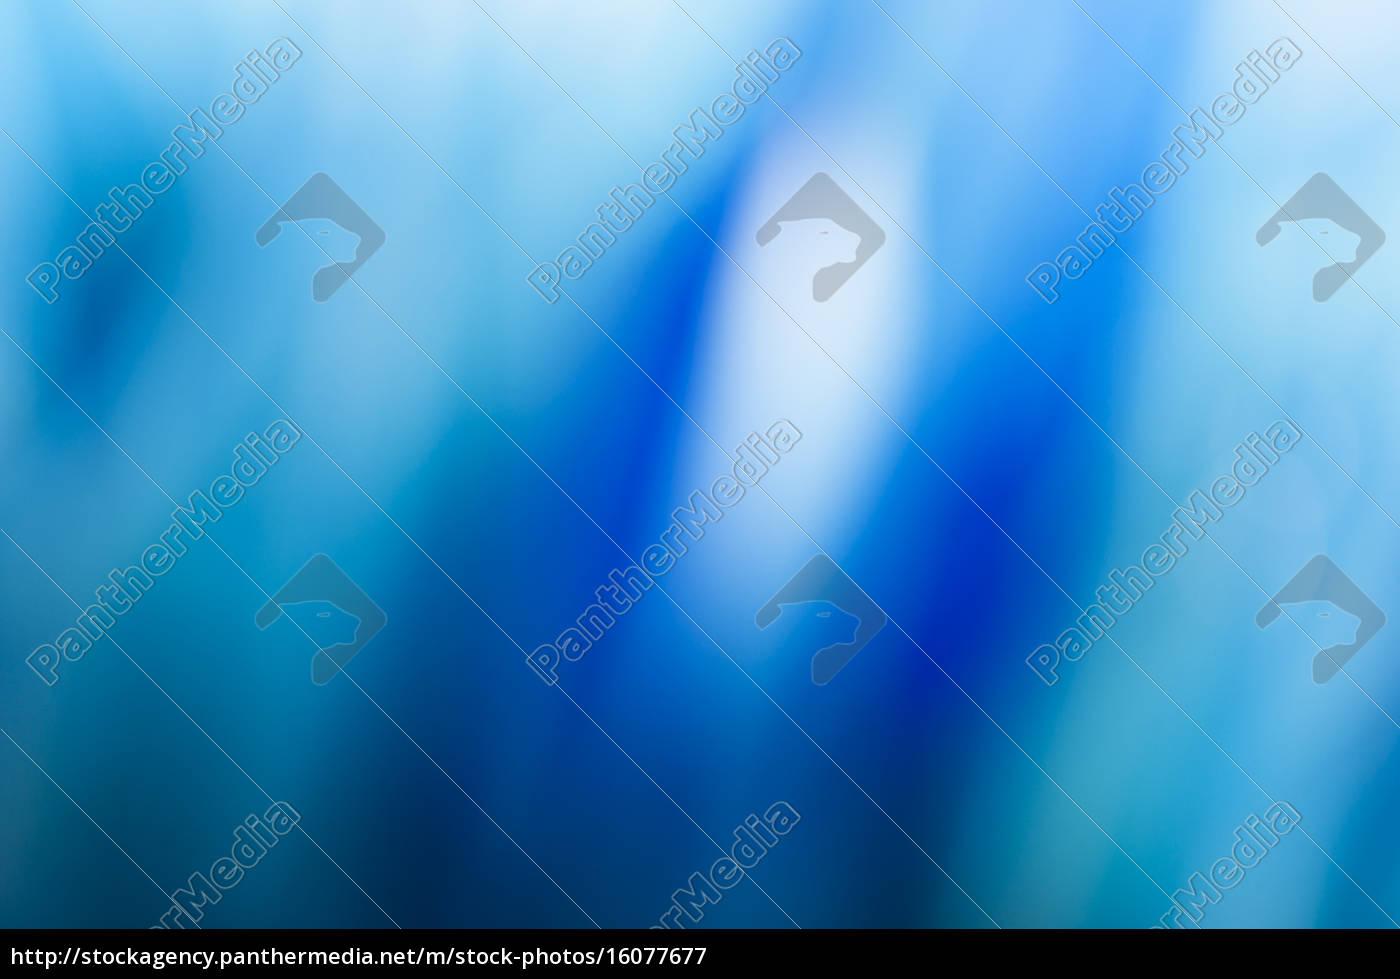 blue, blurred, background - 16077677